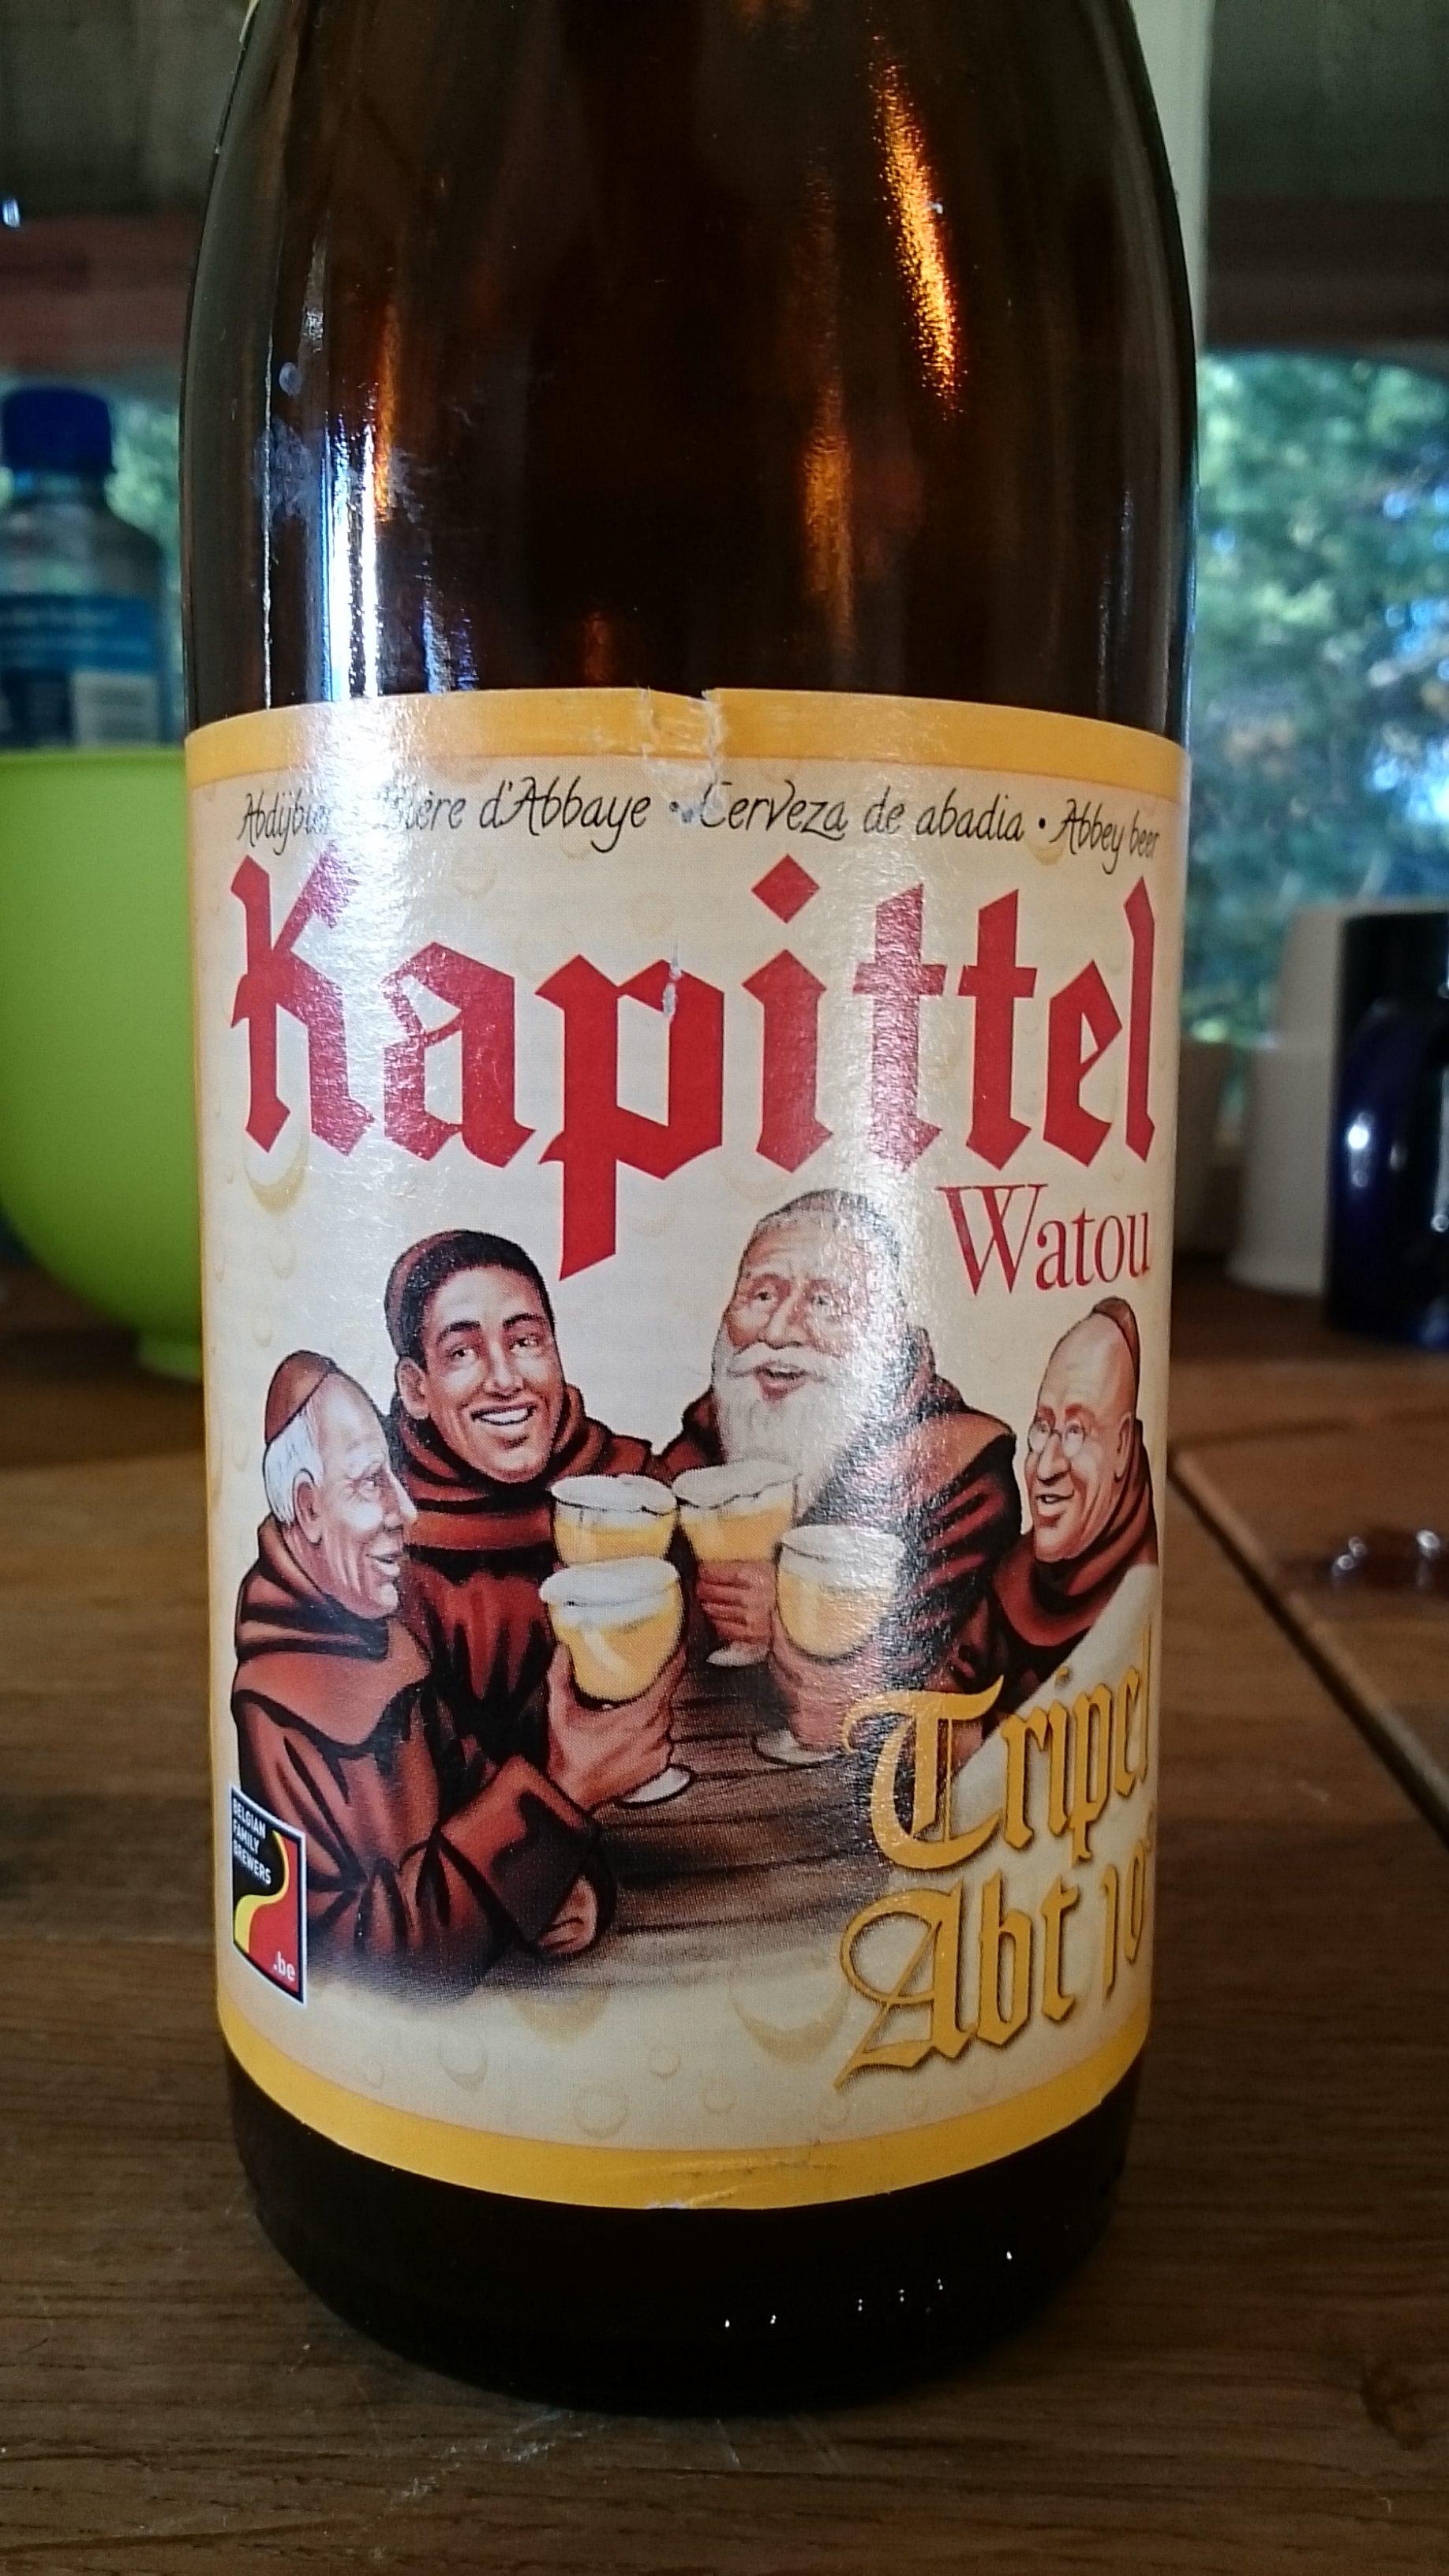 Van Eecke: Kapittel Watou Tripel Abt 10